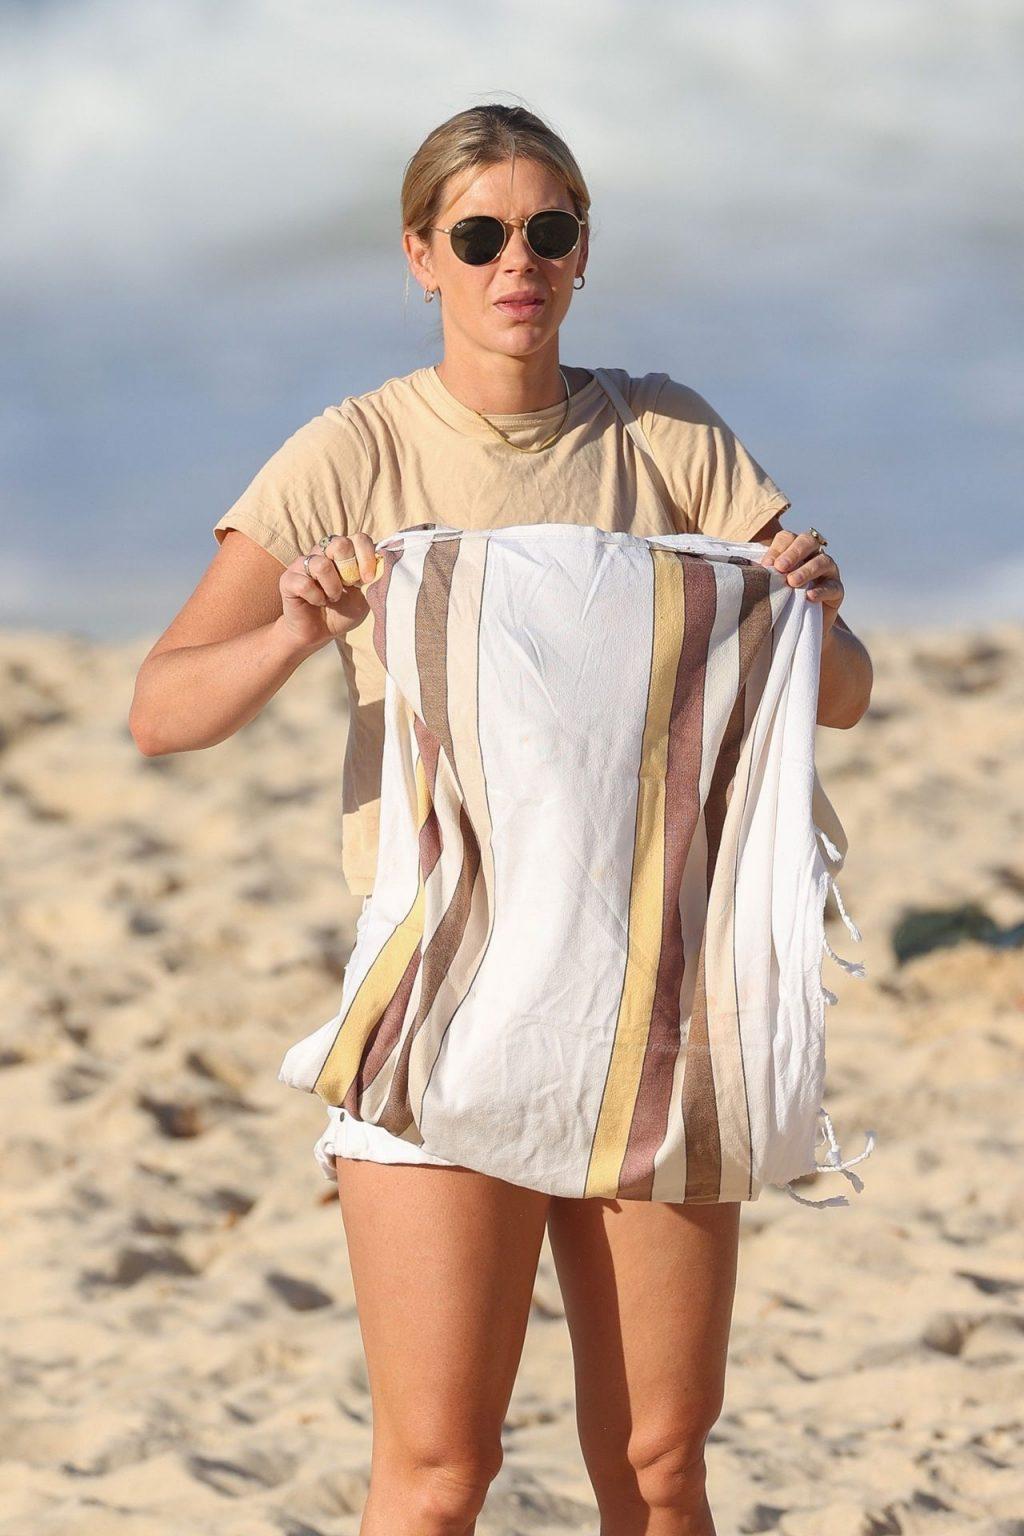 Brittany Hockley Catches Some Sun Rays at Bondi Beach (28 Photos)